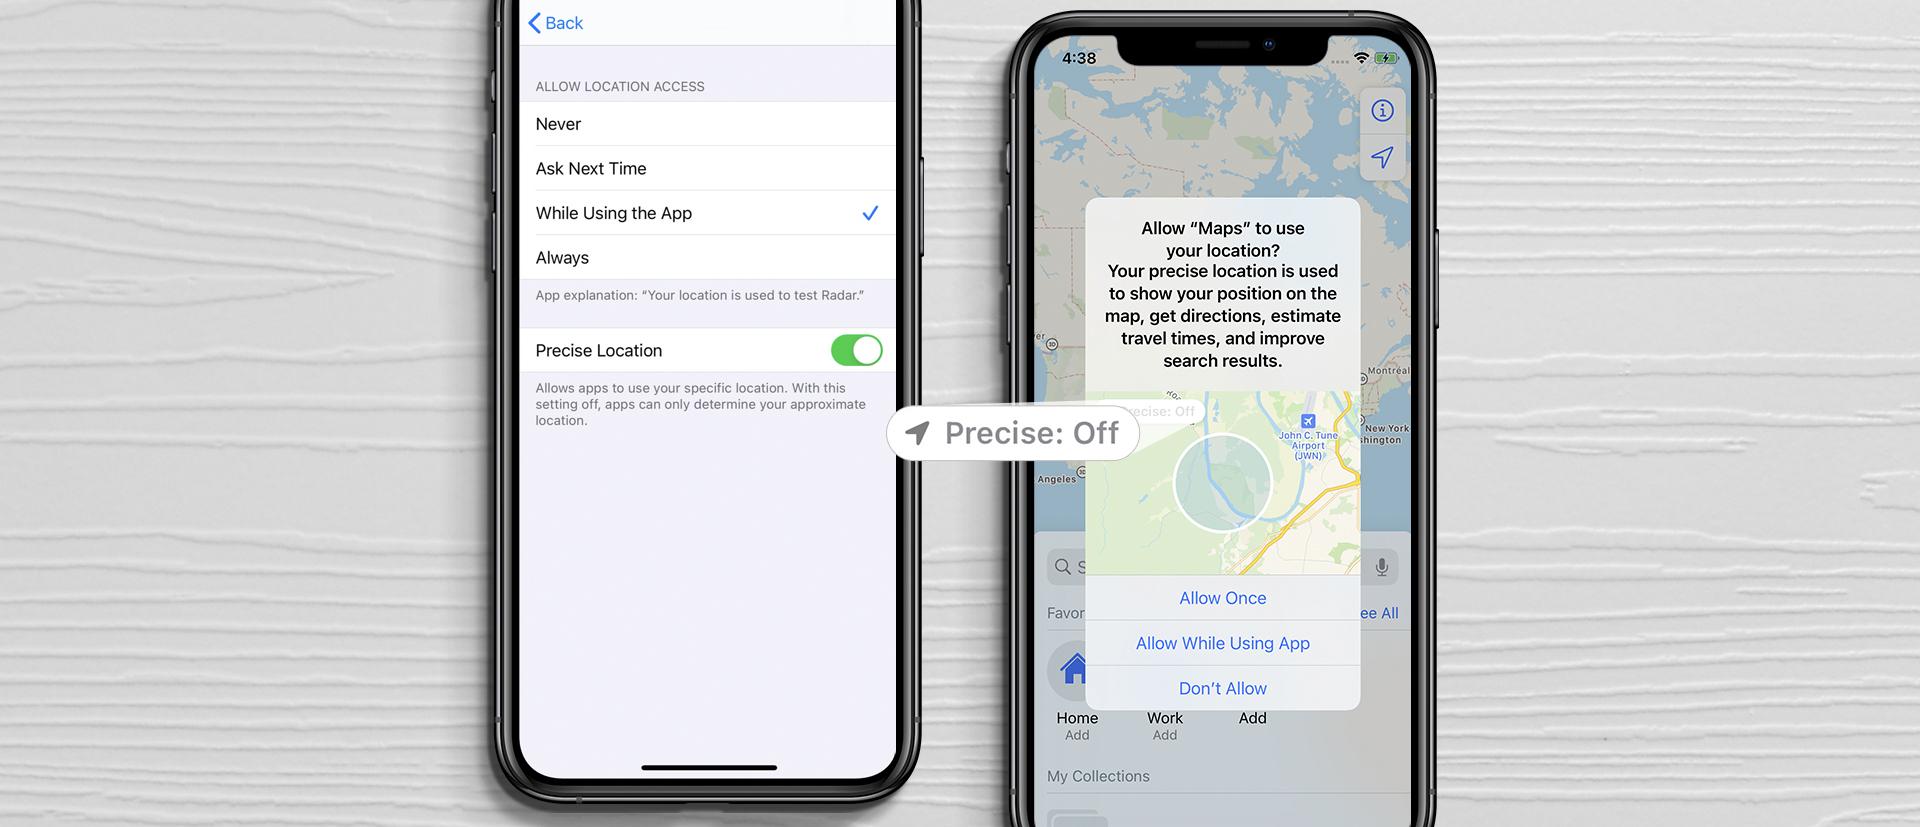 [POST] iOS14 Location Access Update